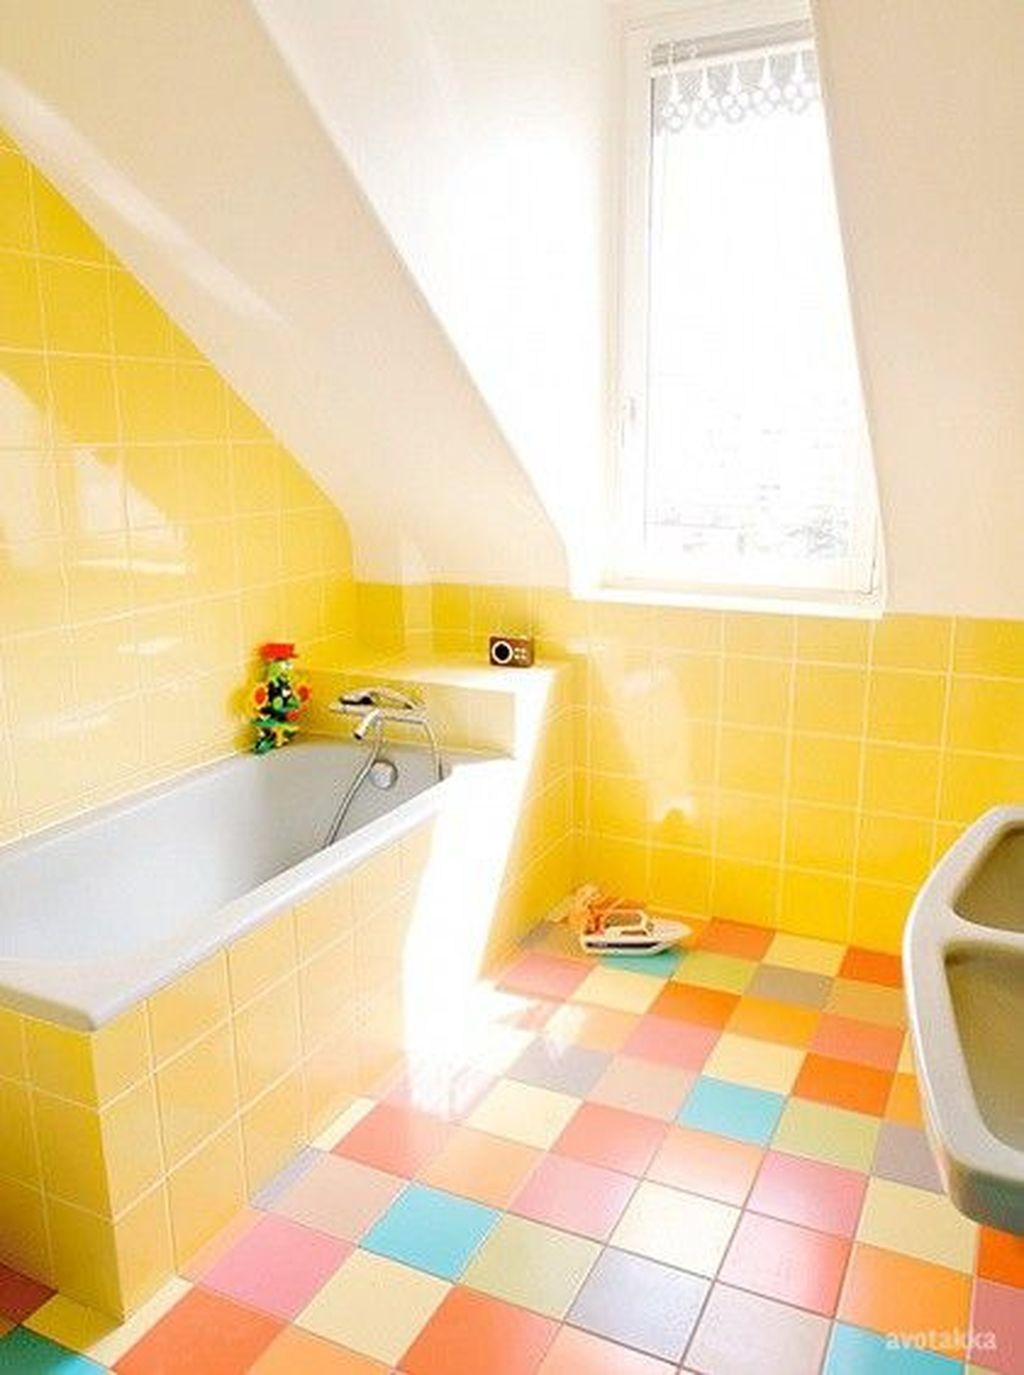 Creative Sunny Yellow Bathroom Decor For Summer 20